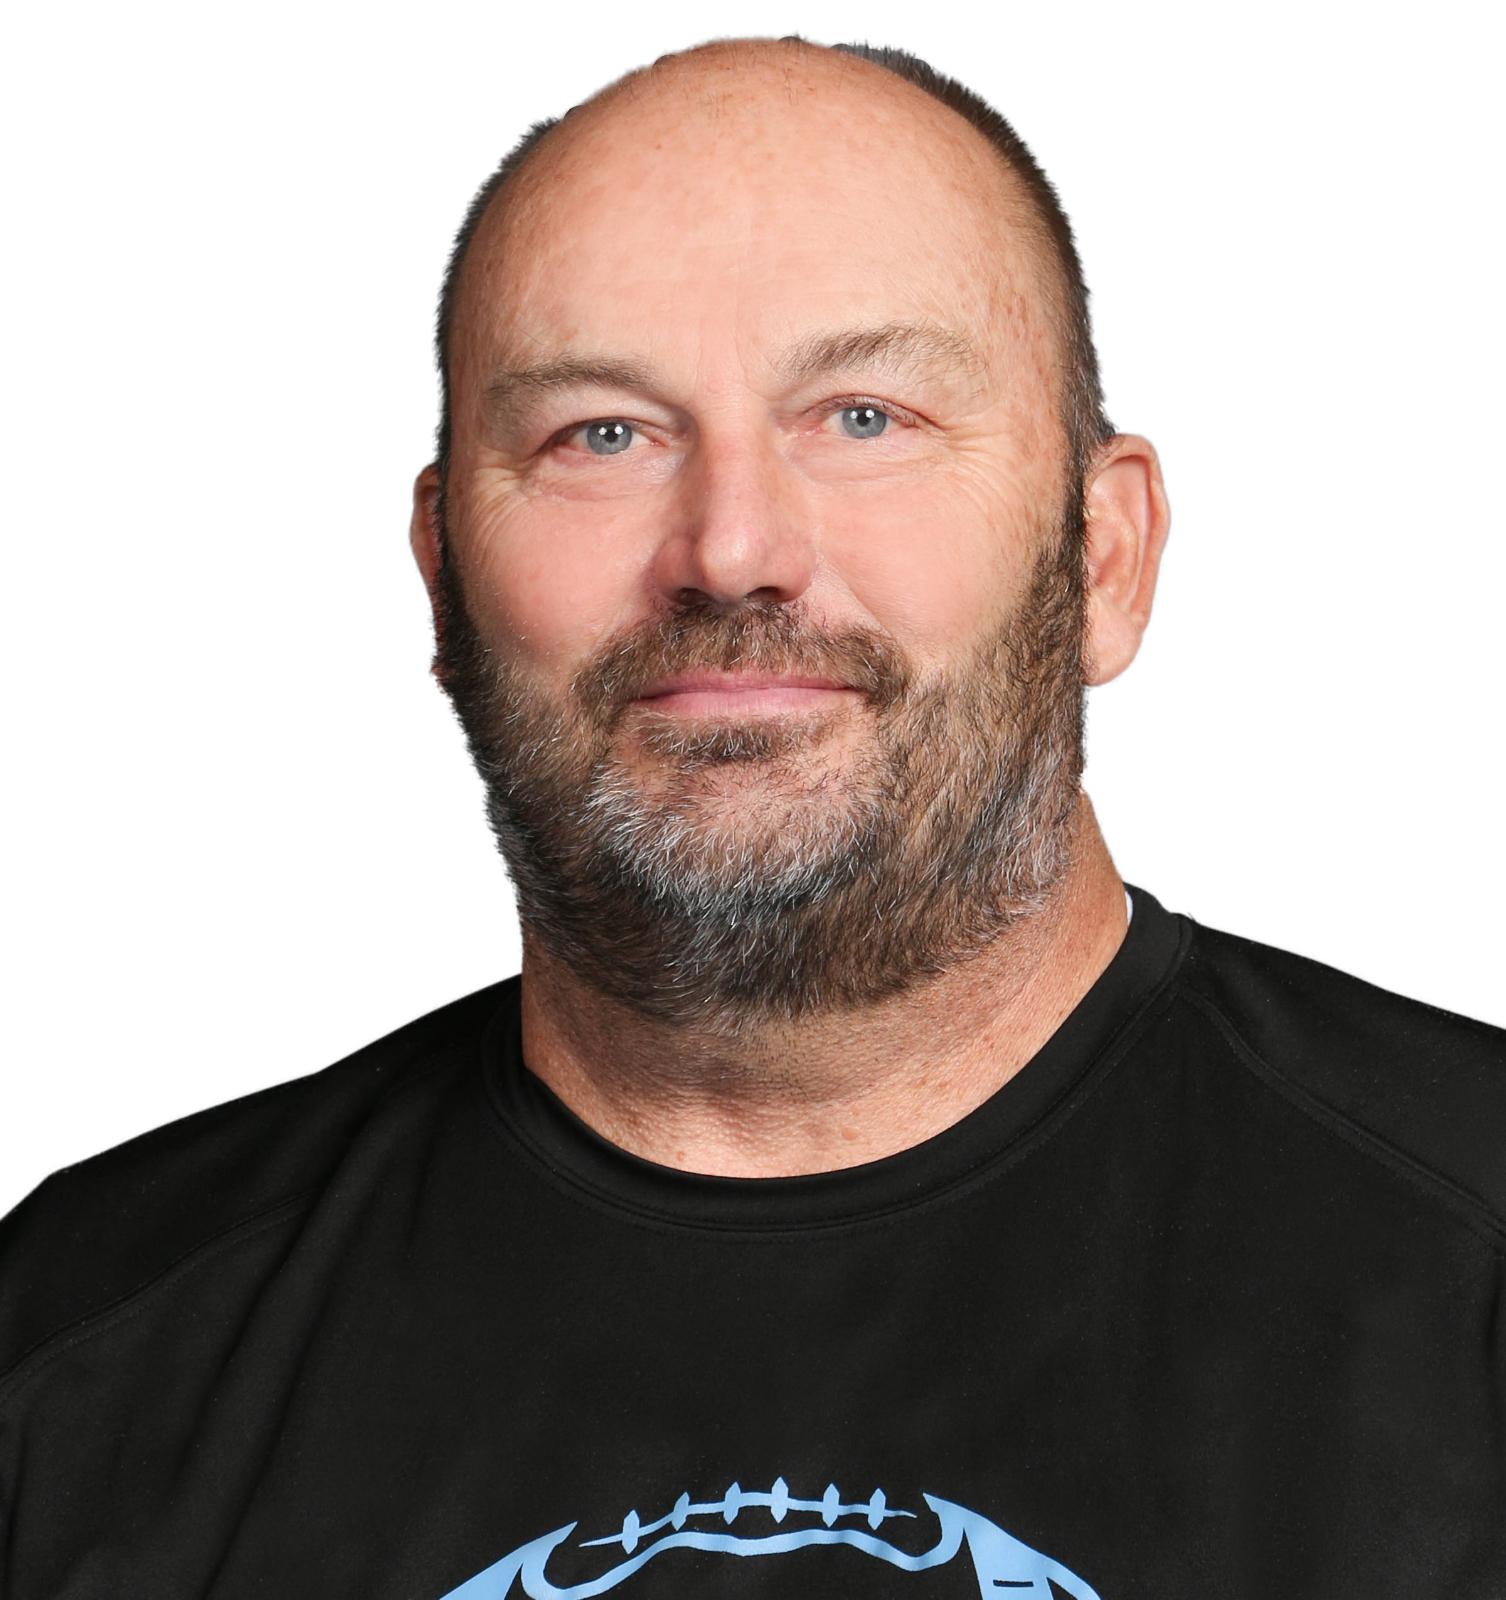 West Jordan High School welcomes new football coach.